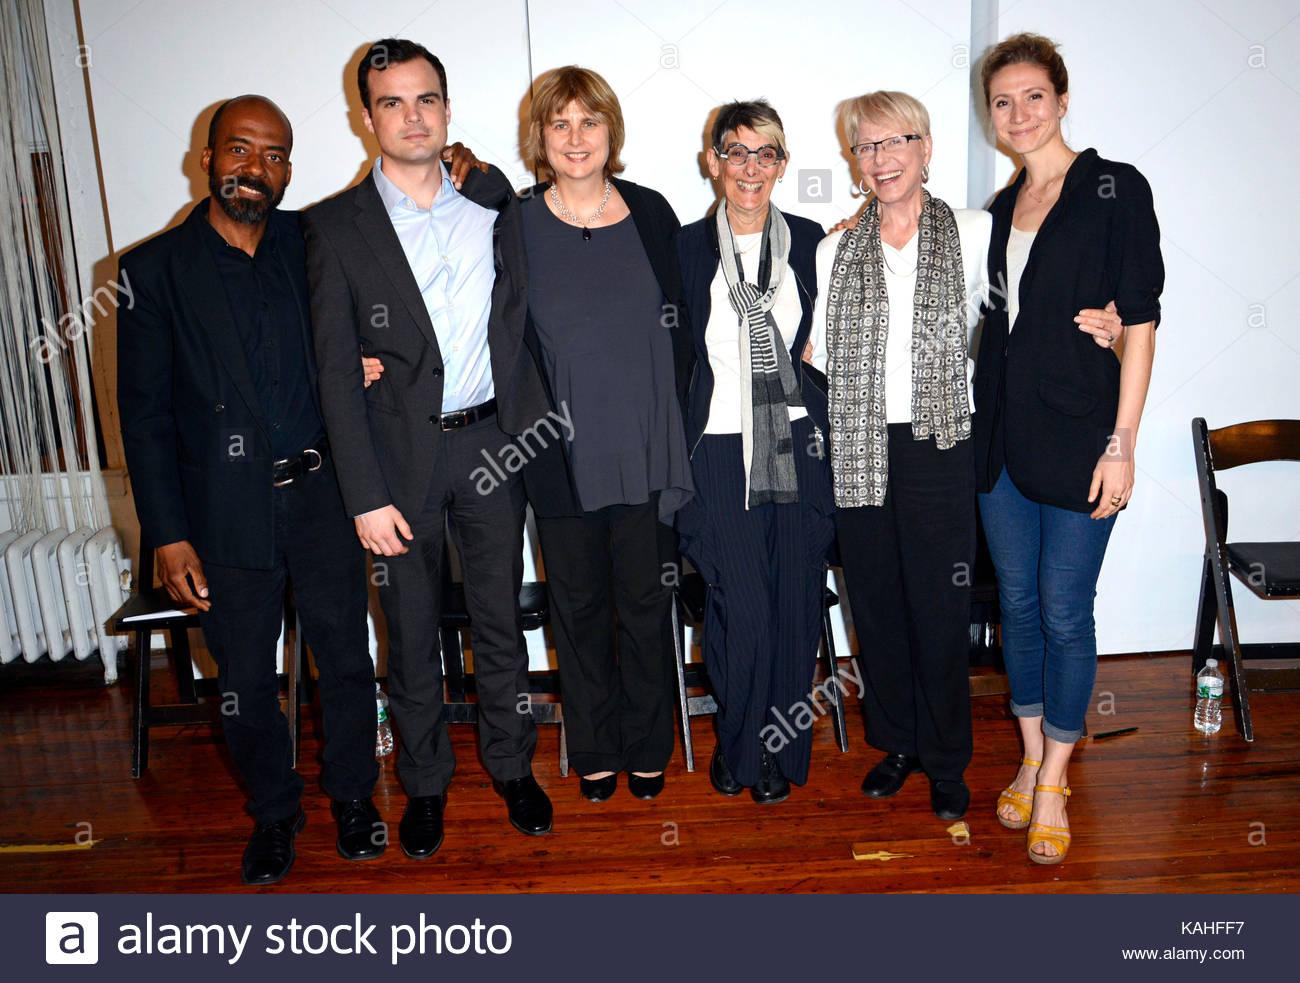 Brian Richardson, Stephen Plunkett, Ludovica Villar-Hauser, Marilyn Harris Kriegel, Karen Grassle and Kathleen Wise. - Stock Image